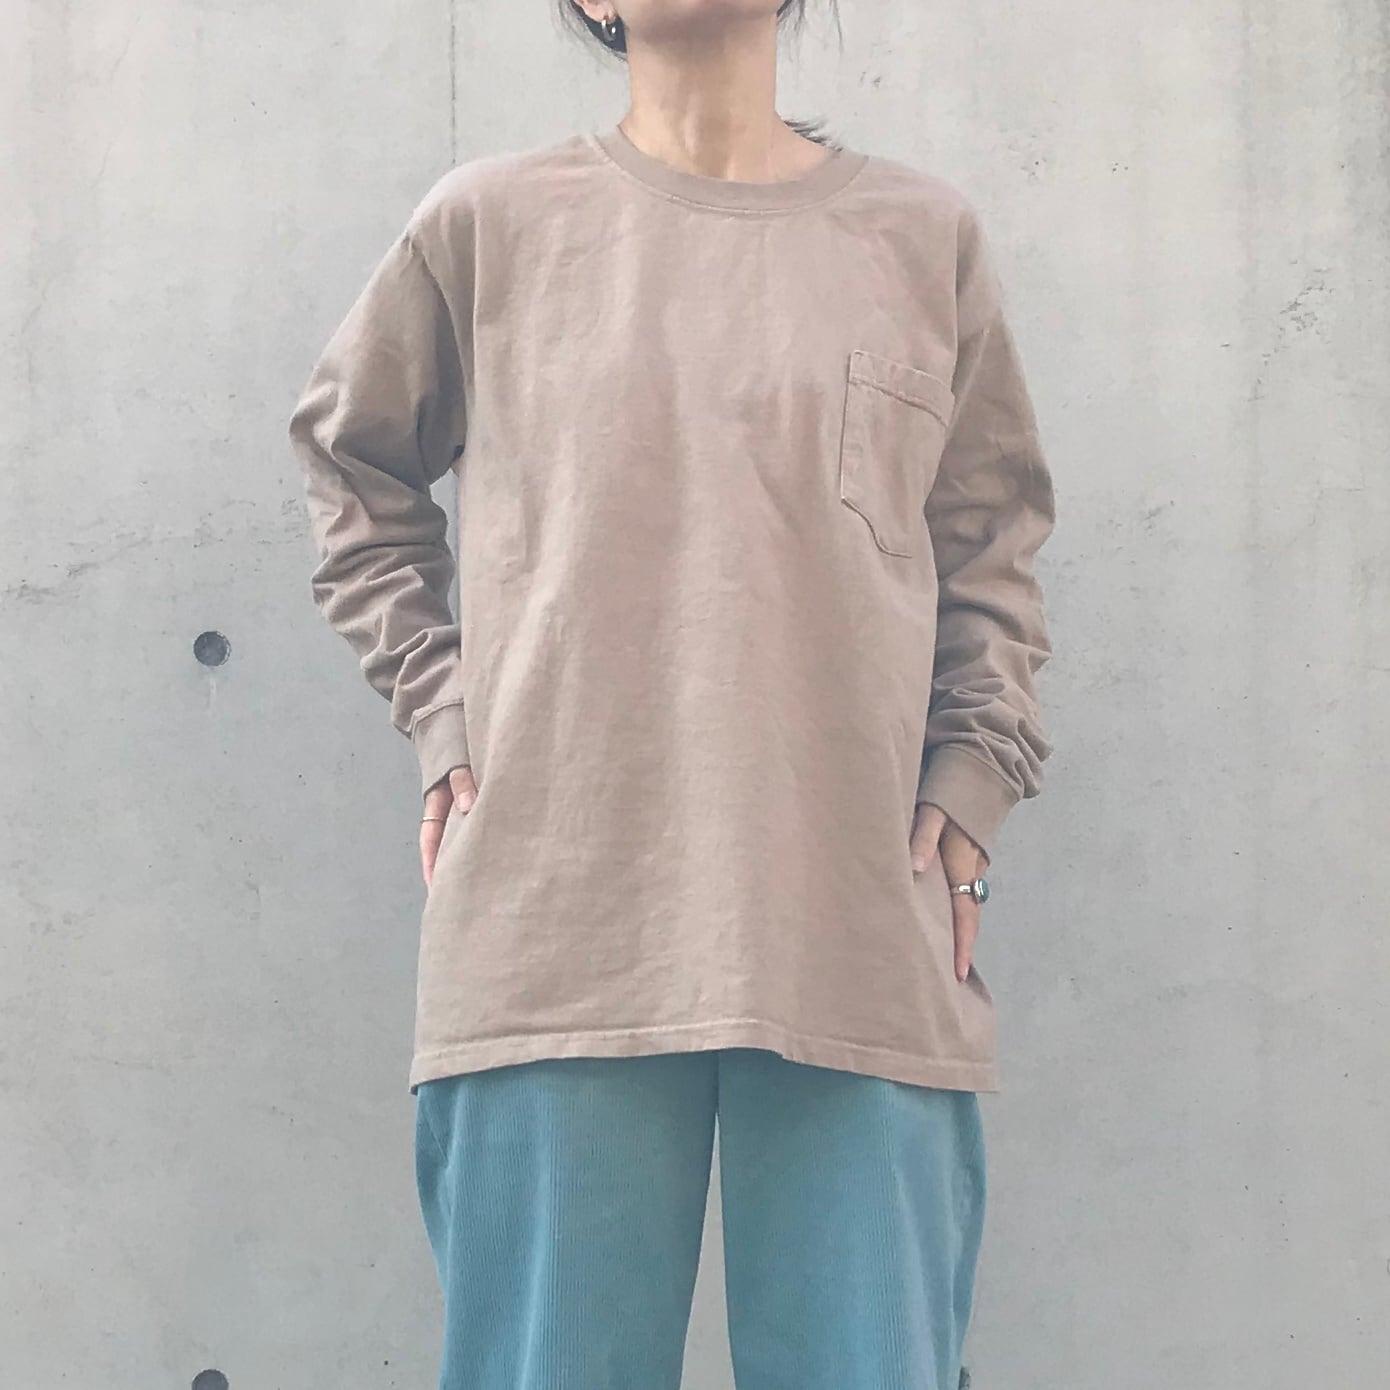 Goodwear ロングスリーブTシャツ BEG